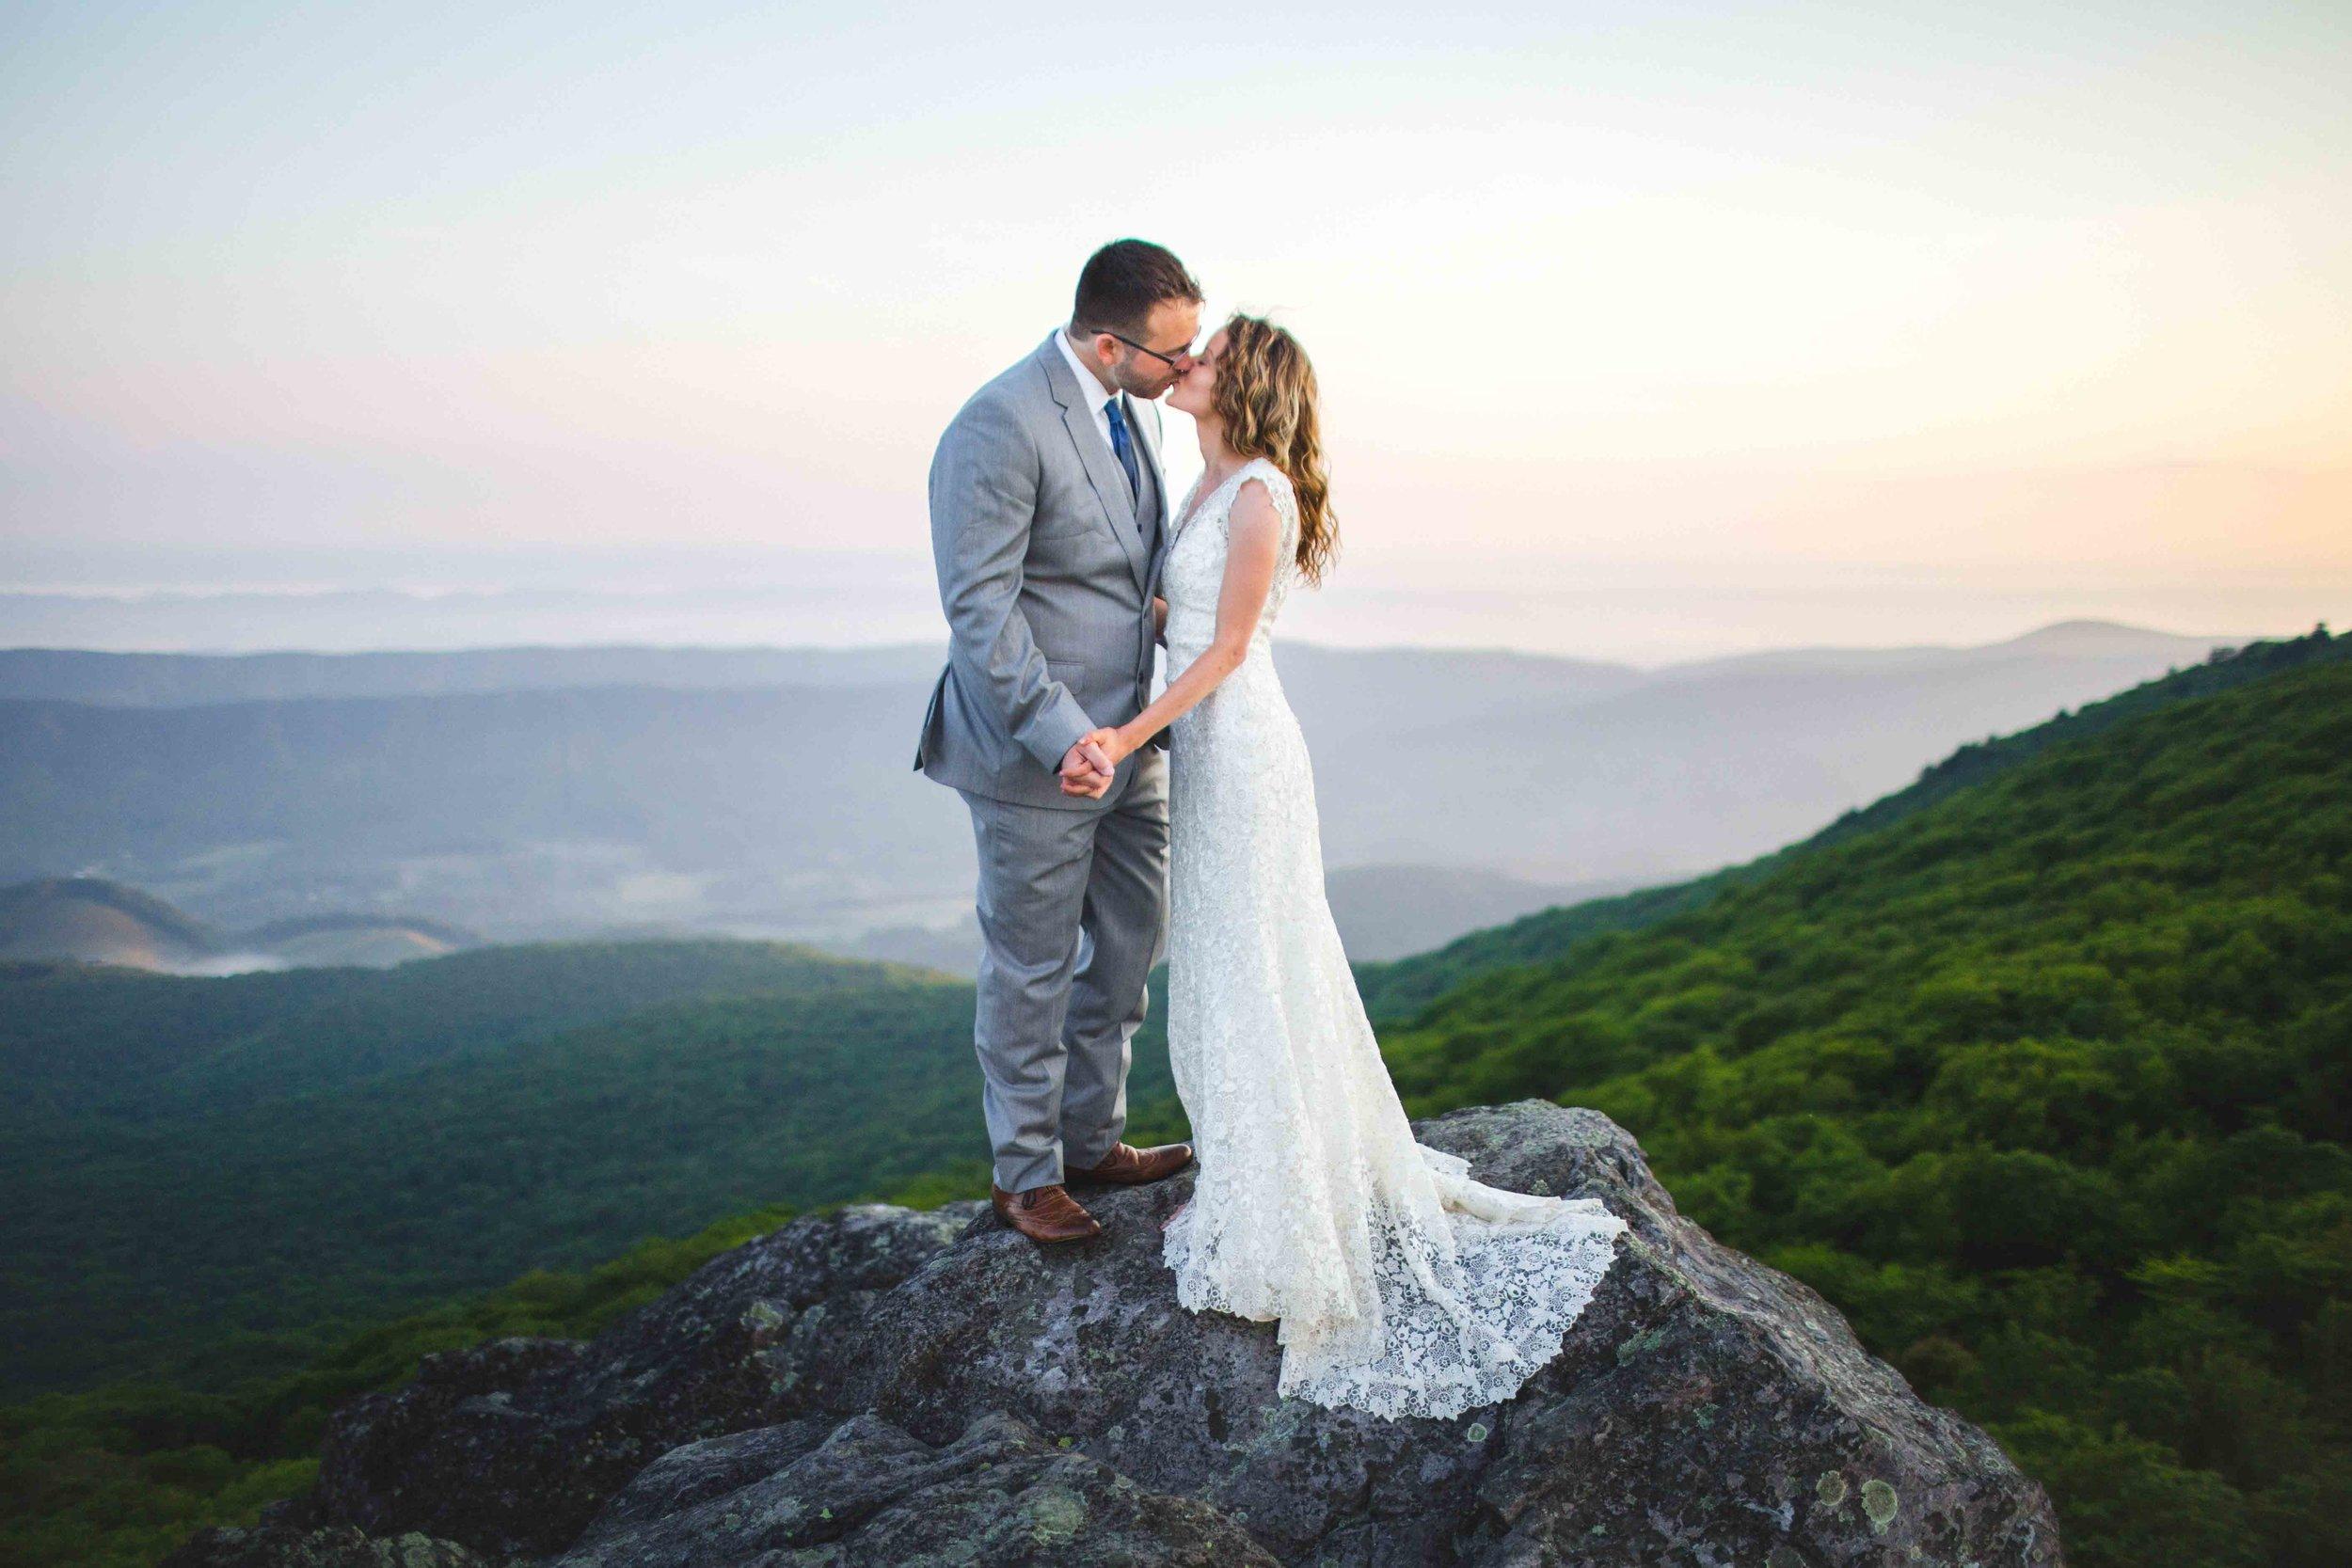 north-carolina-elopement-photographer-51.jpg